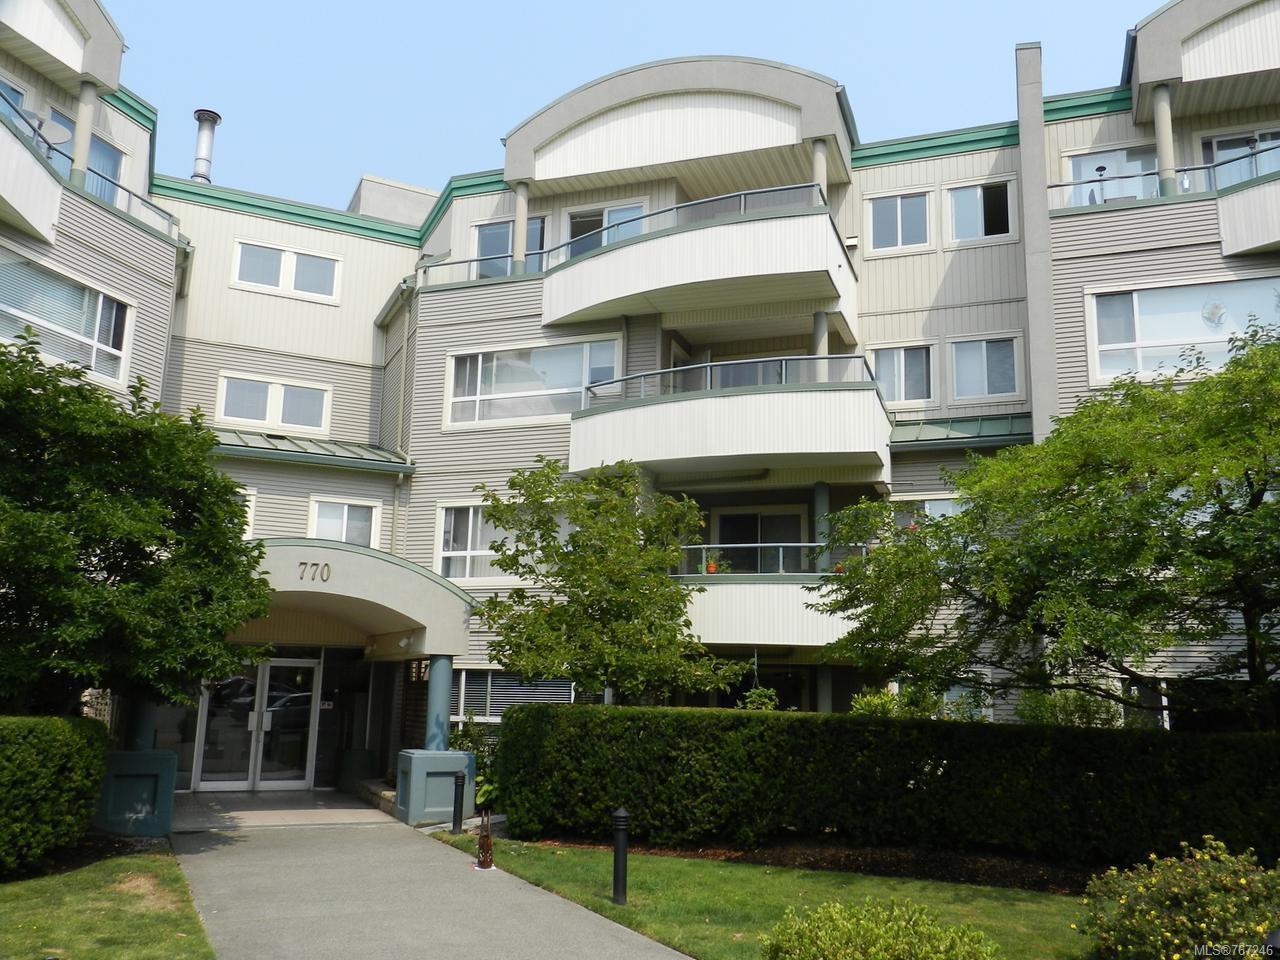 Main Photo: 404 770 POPLAR STREET in NANAIMO: Na Brechin Hill Condo for sale (Nanaimo)  : MLS®# 767246